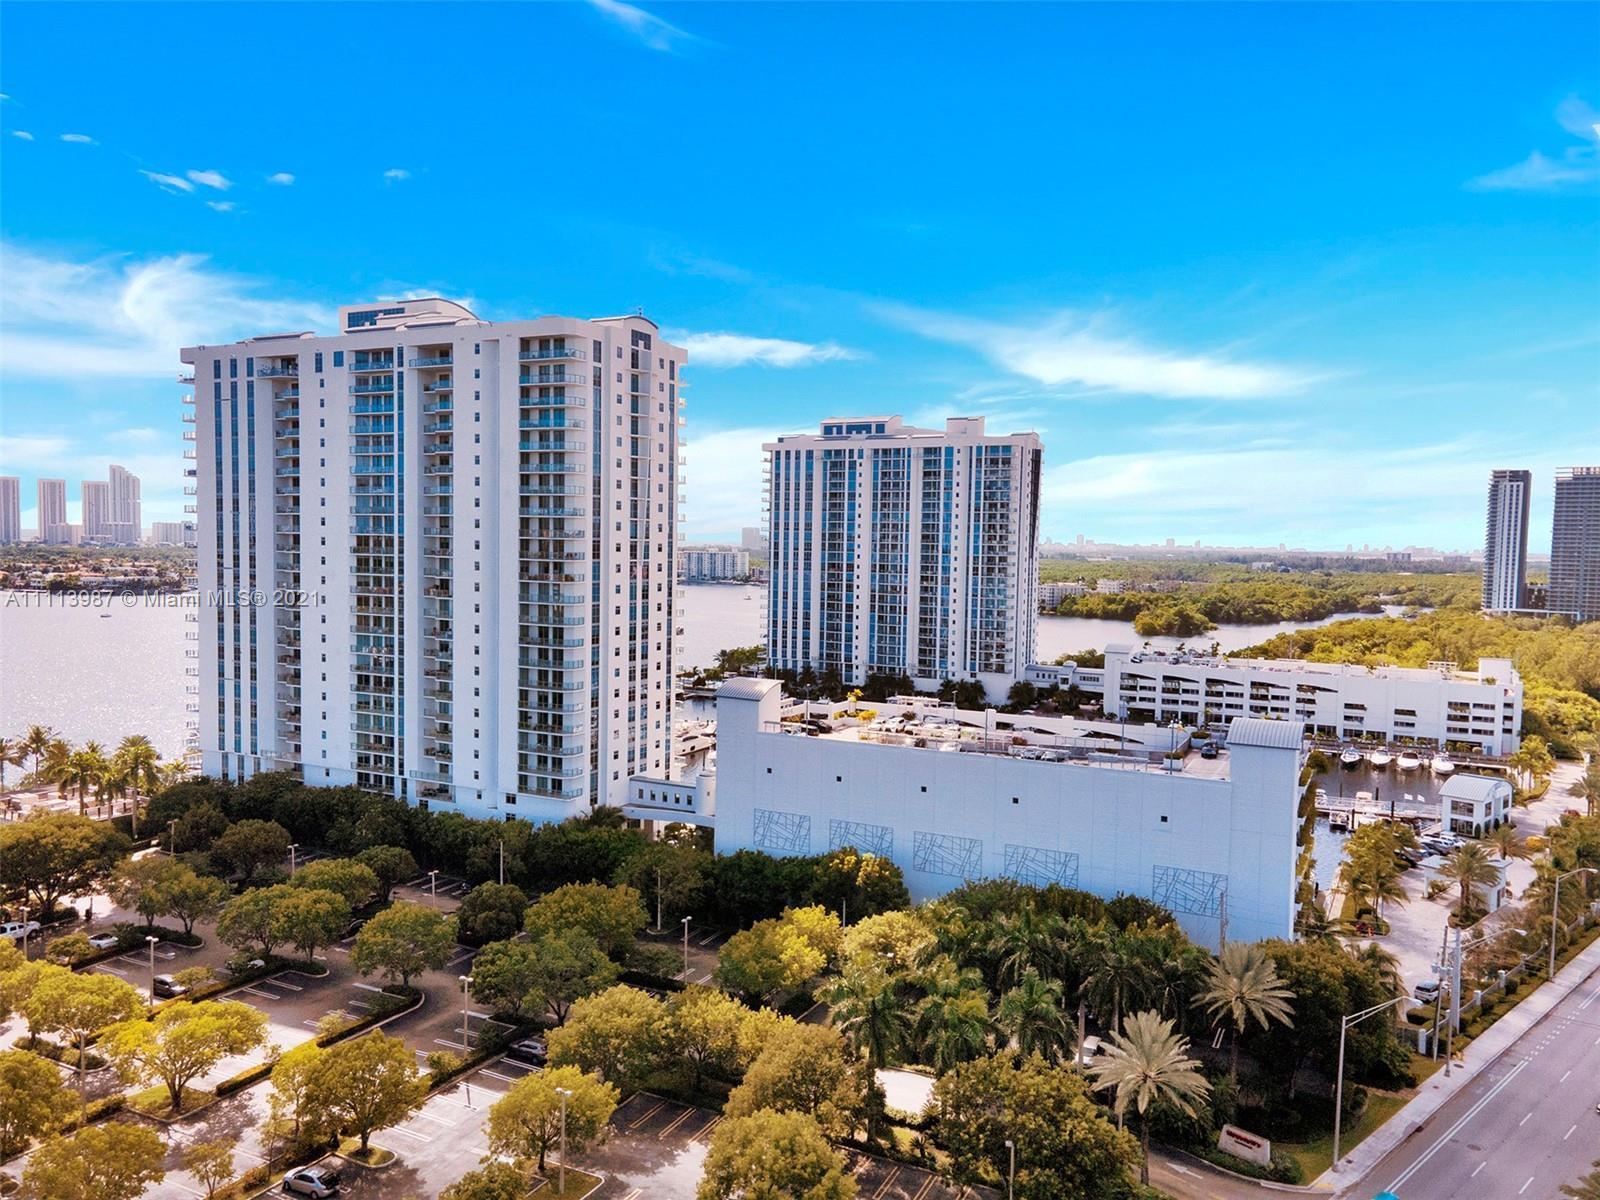 17301 Biscayne Blvd Unit 1410, North Miami Beach, Florida 33160